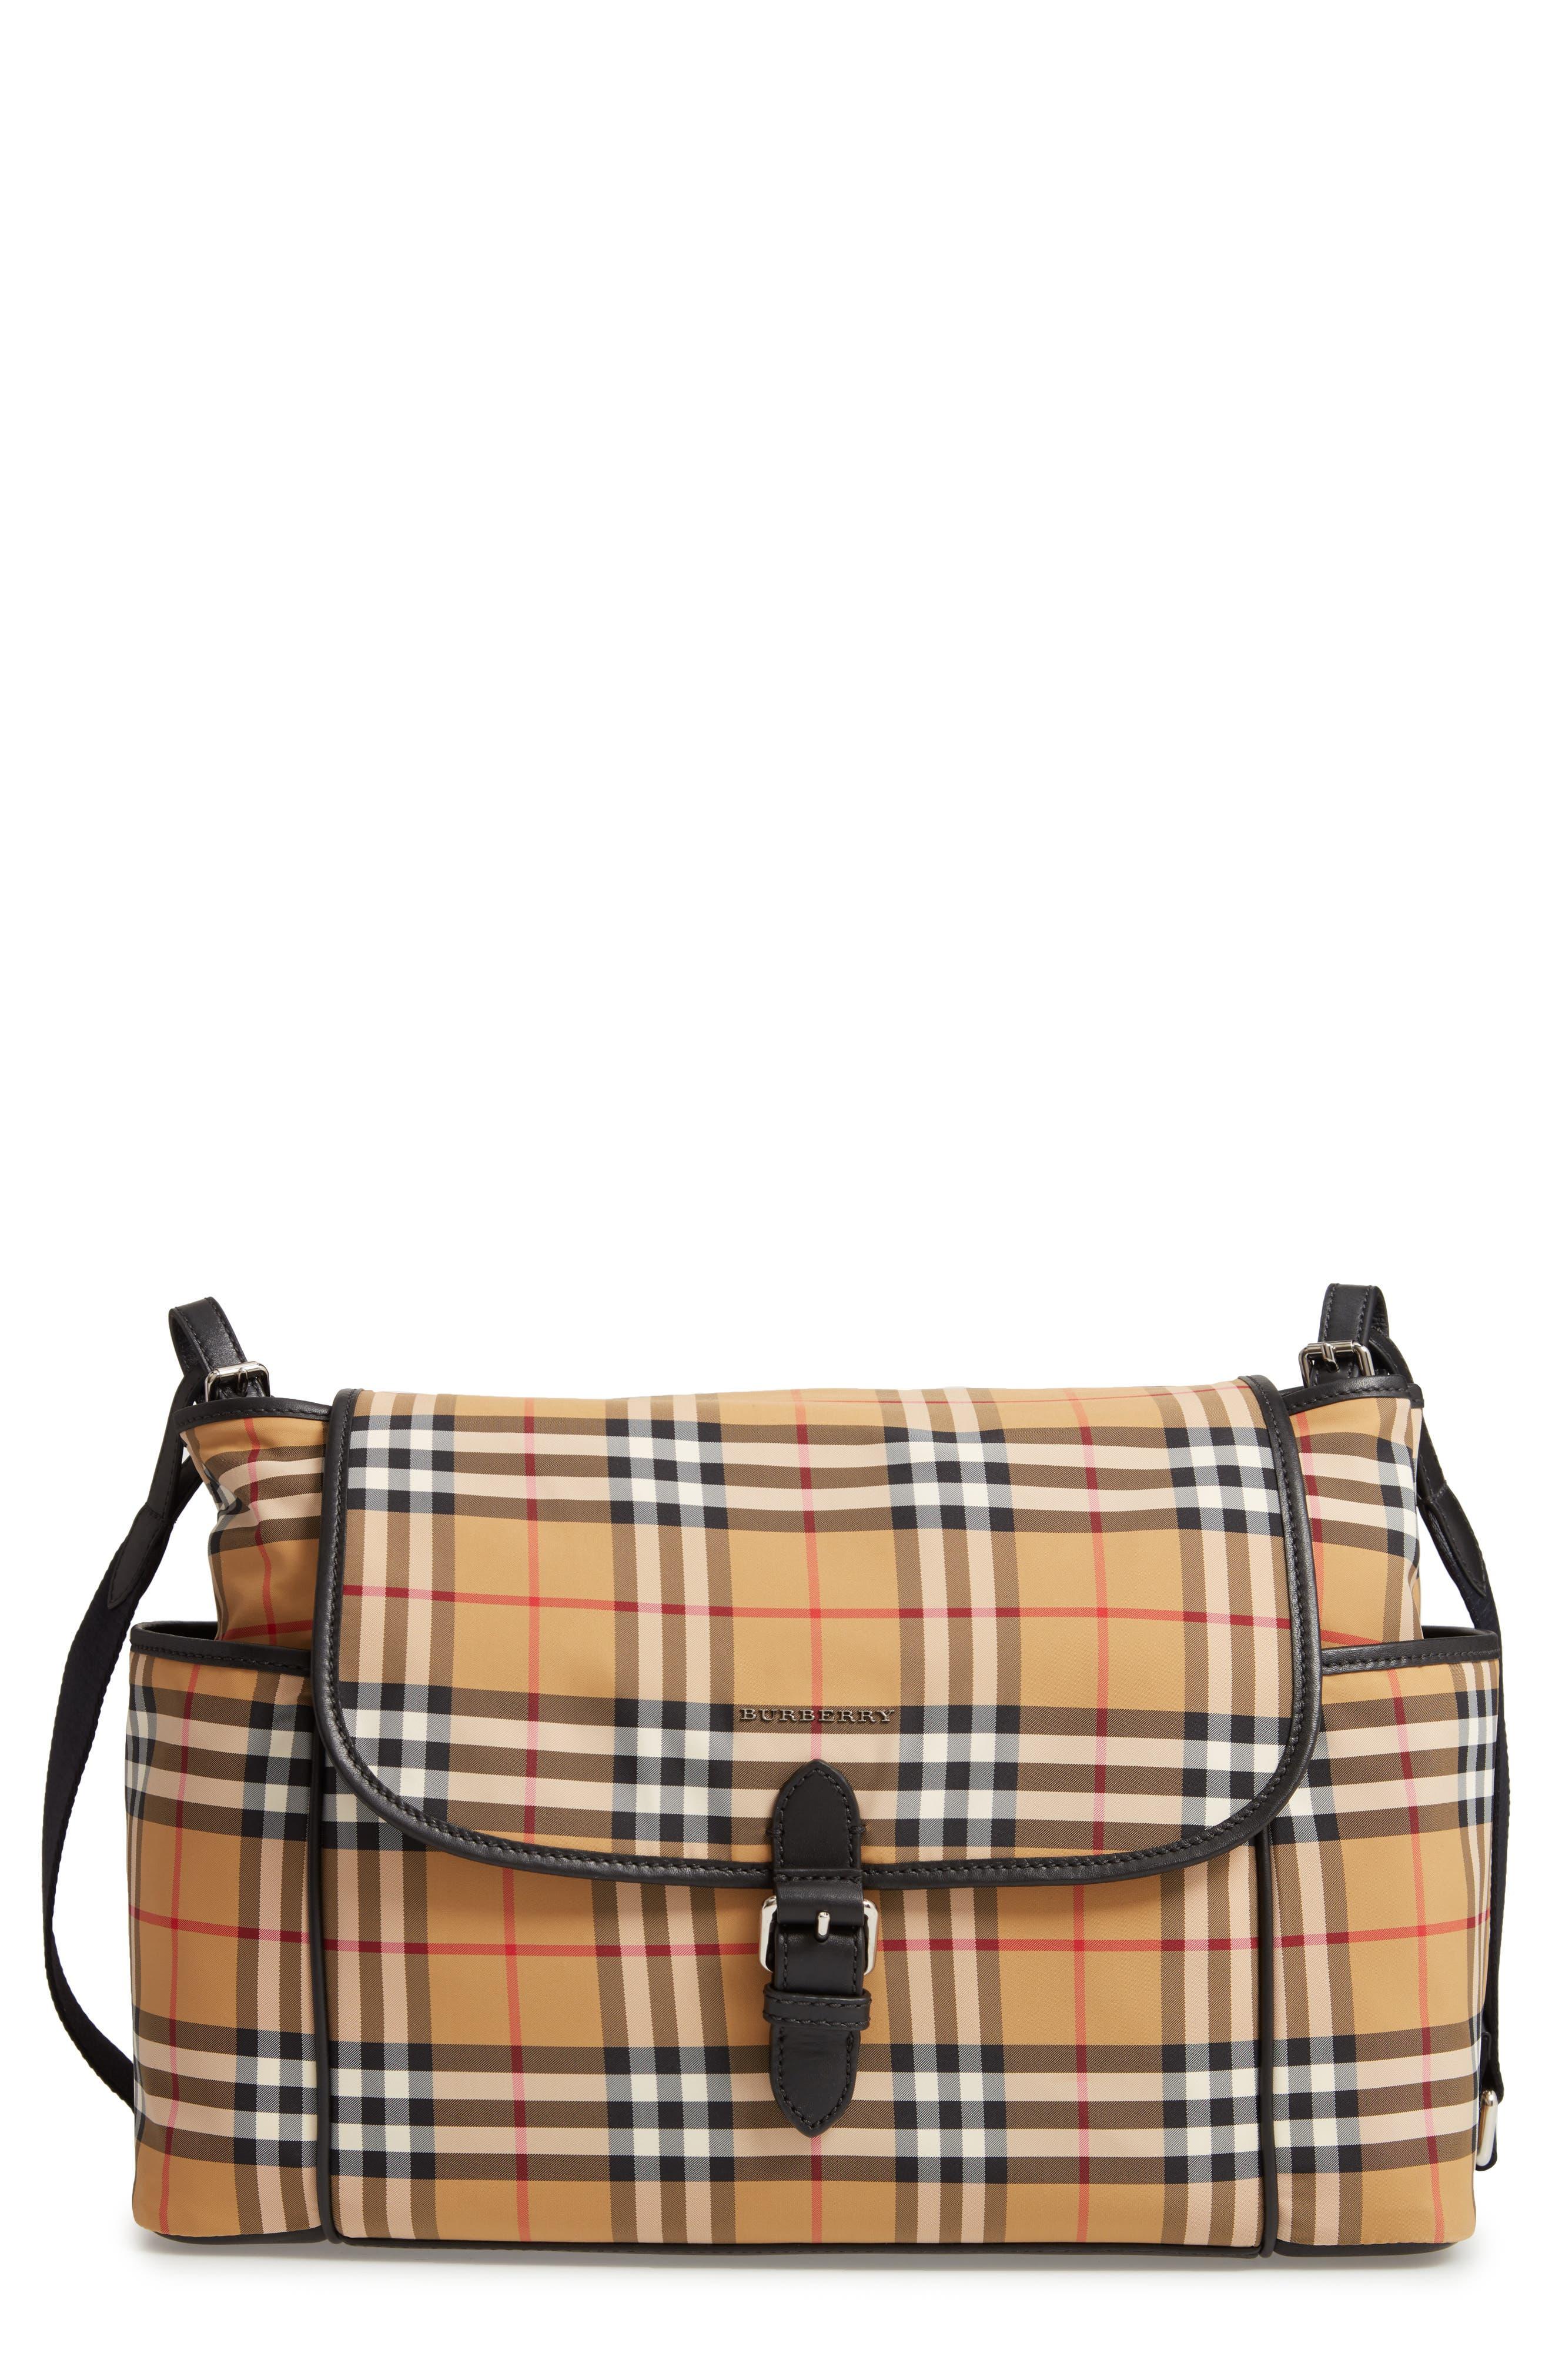 BURBERRY Flap Diaper Bag, Main, color, ANTIQUE YELLOW/ BLCK